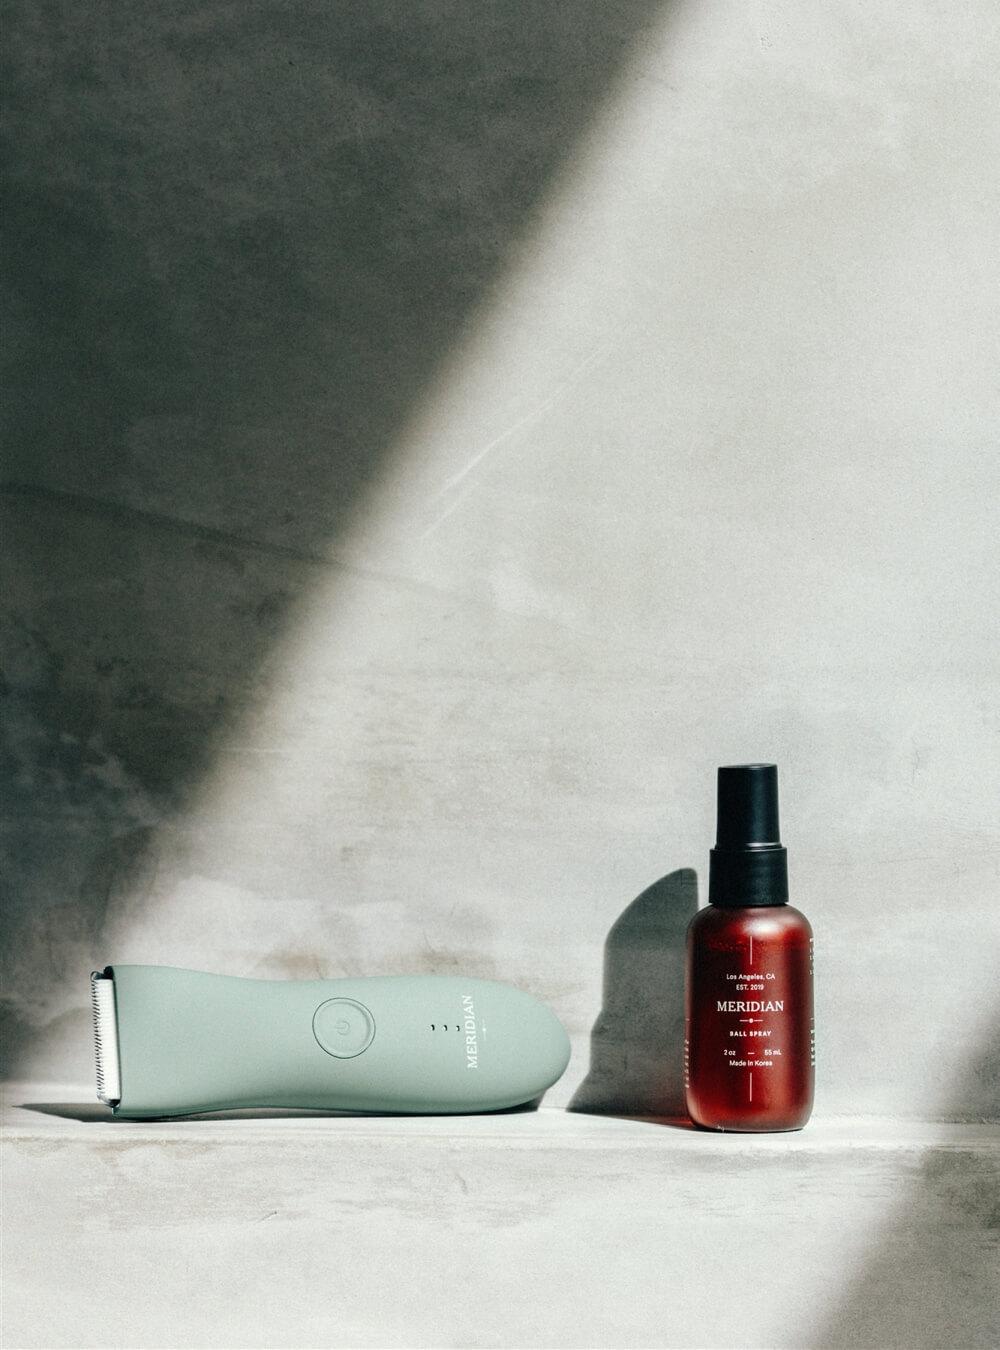 Meridian men's body hair grooming products